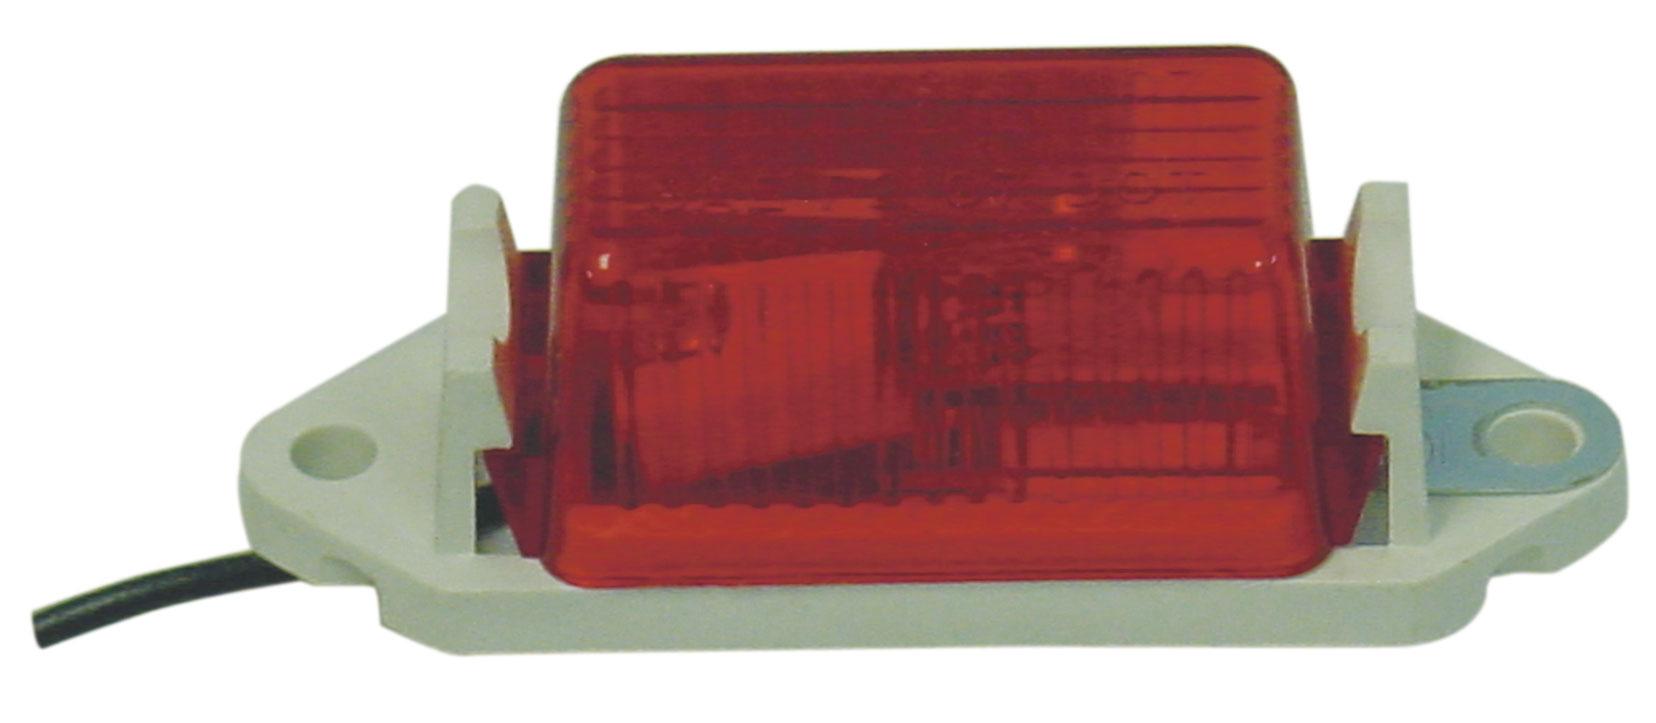 0496110712 - Red 2 Hole Saep2 97 Dot Marker Light